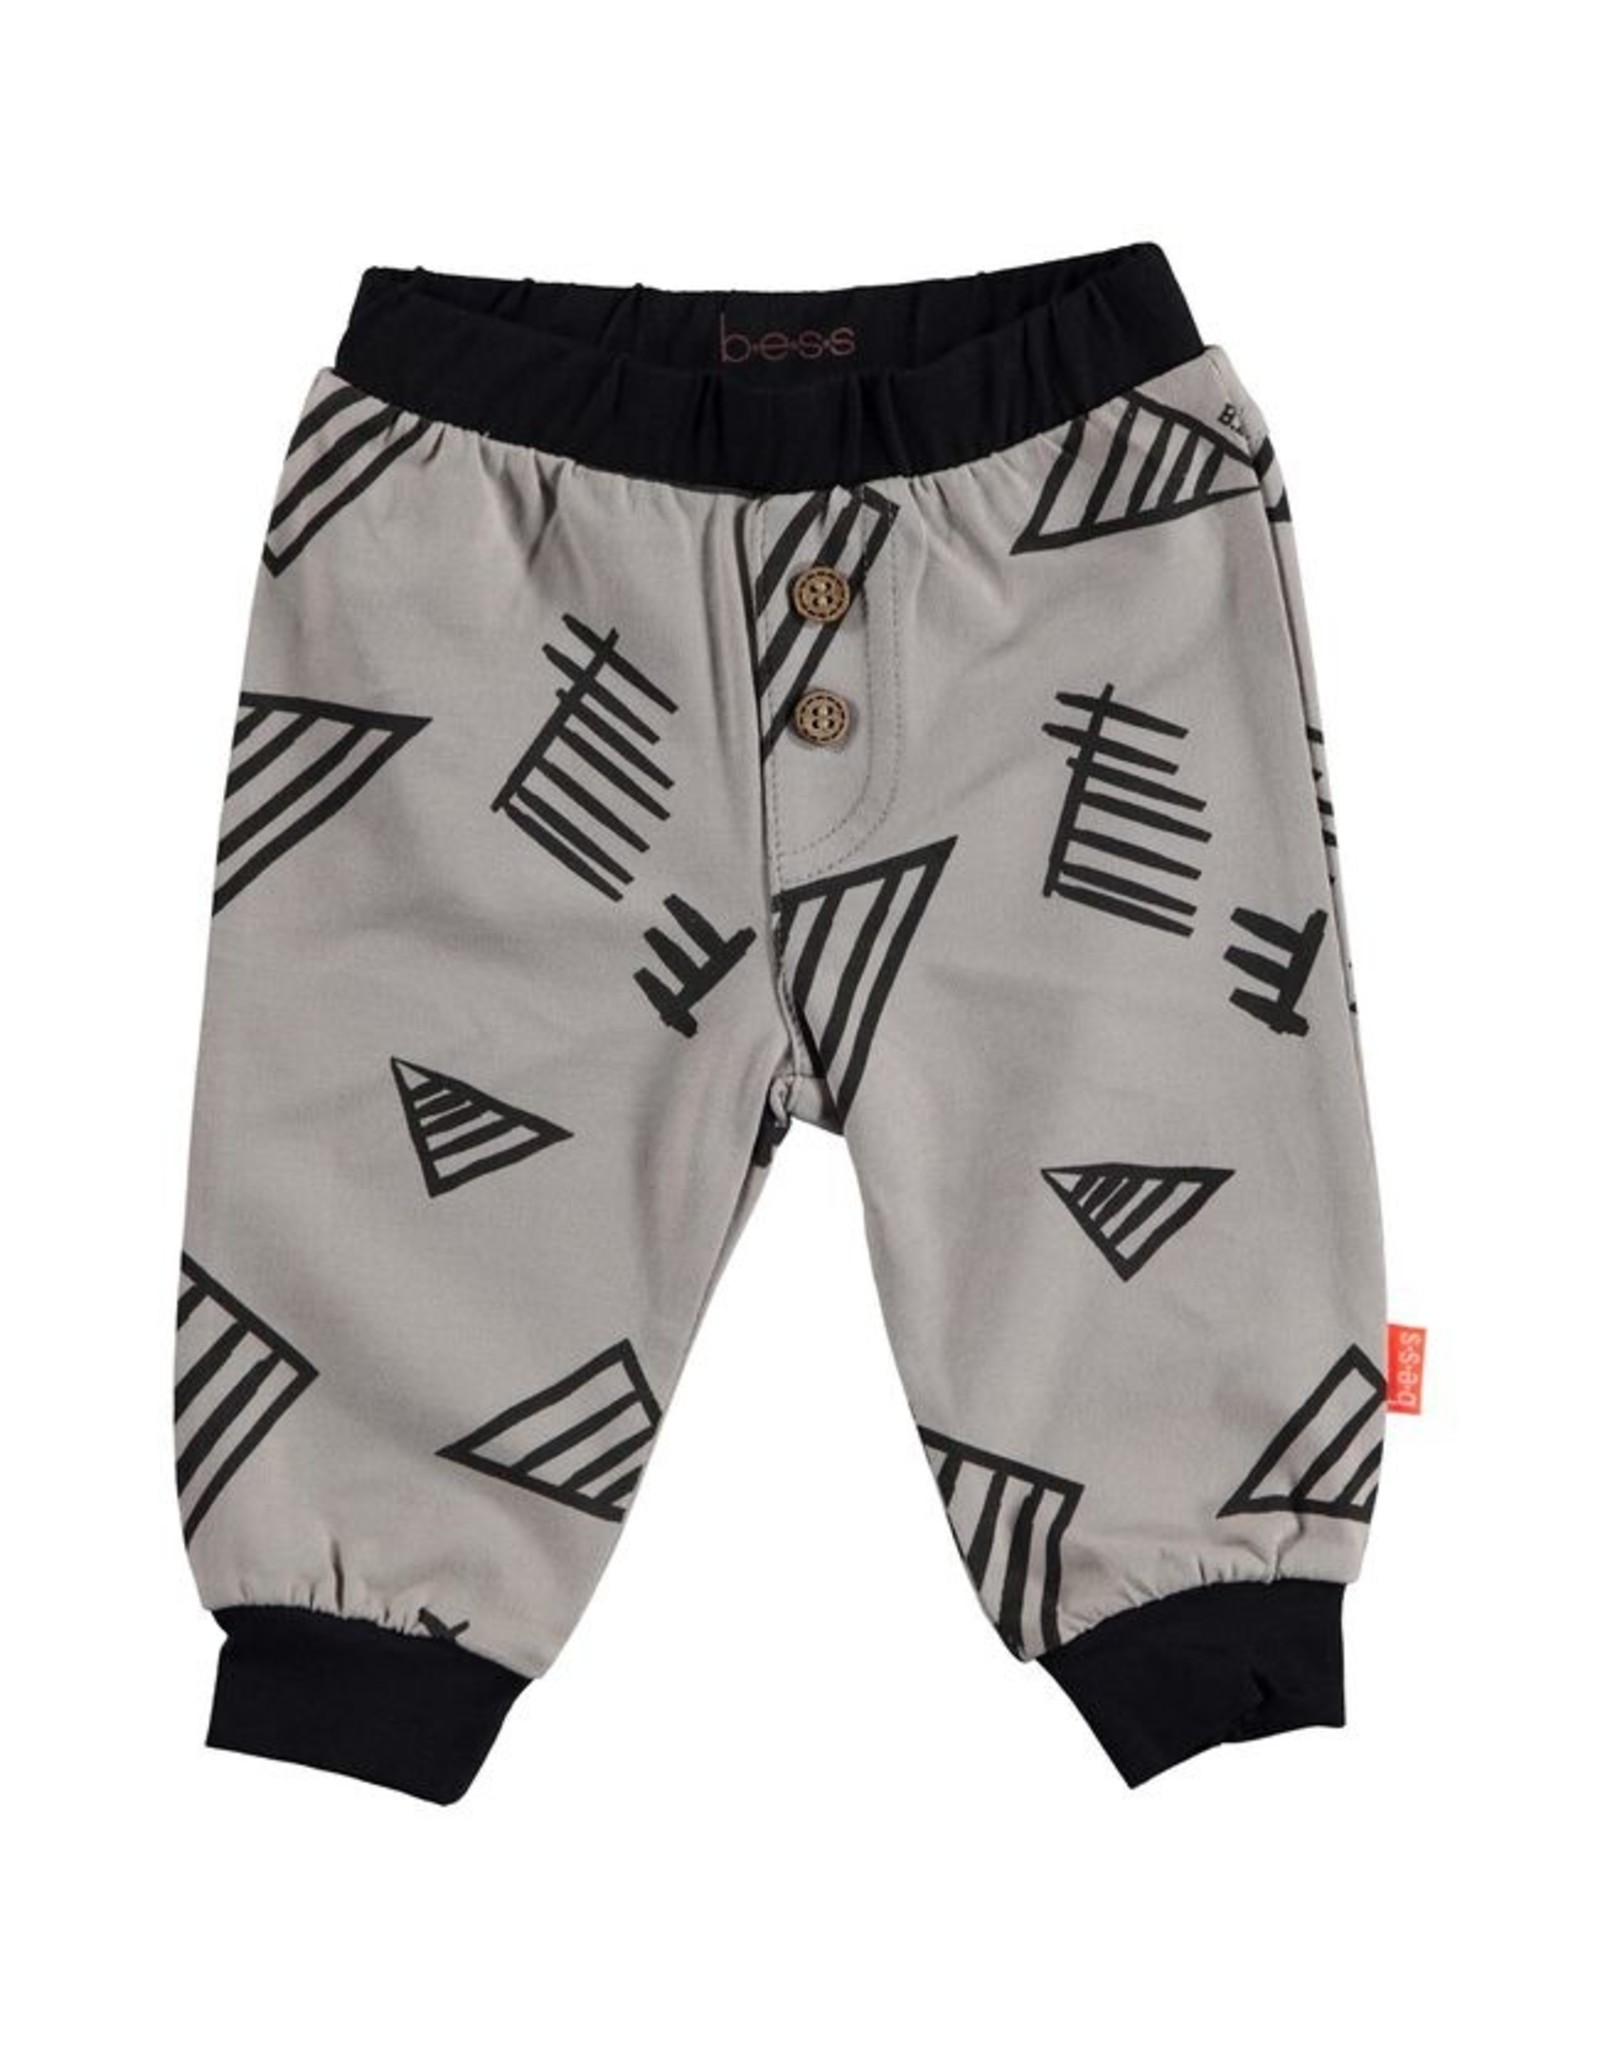 BESS BESS Pants Graphic